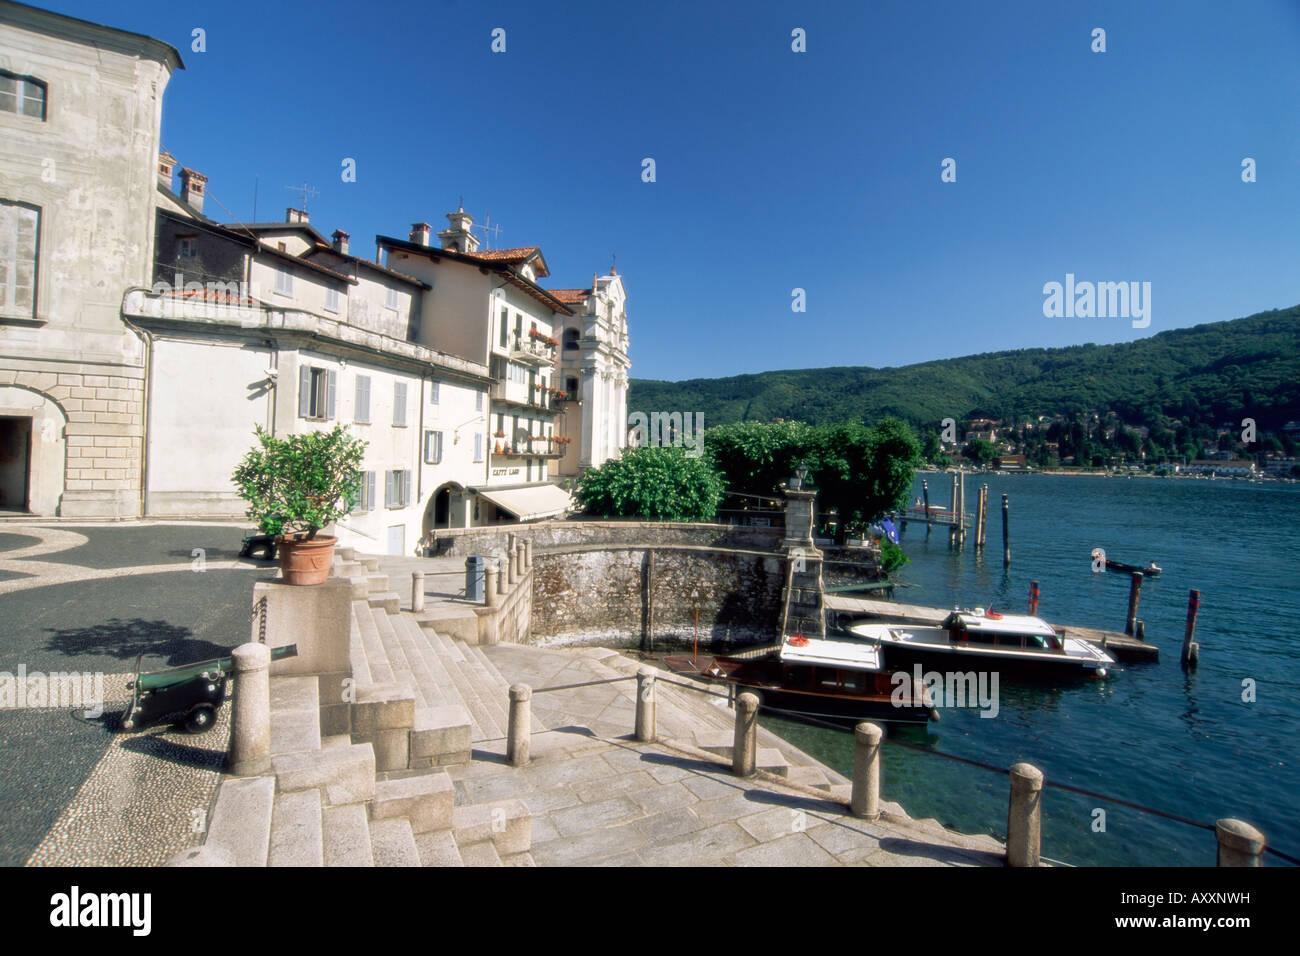 Isola Bella, Boromean Islands, Lake Maggiore, Italian Lakes, Piemonte (Piedmont), Italy, Europe - Stock Image